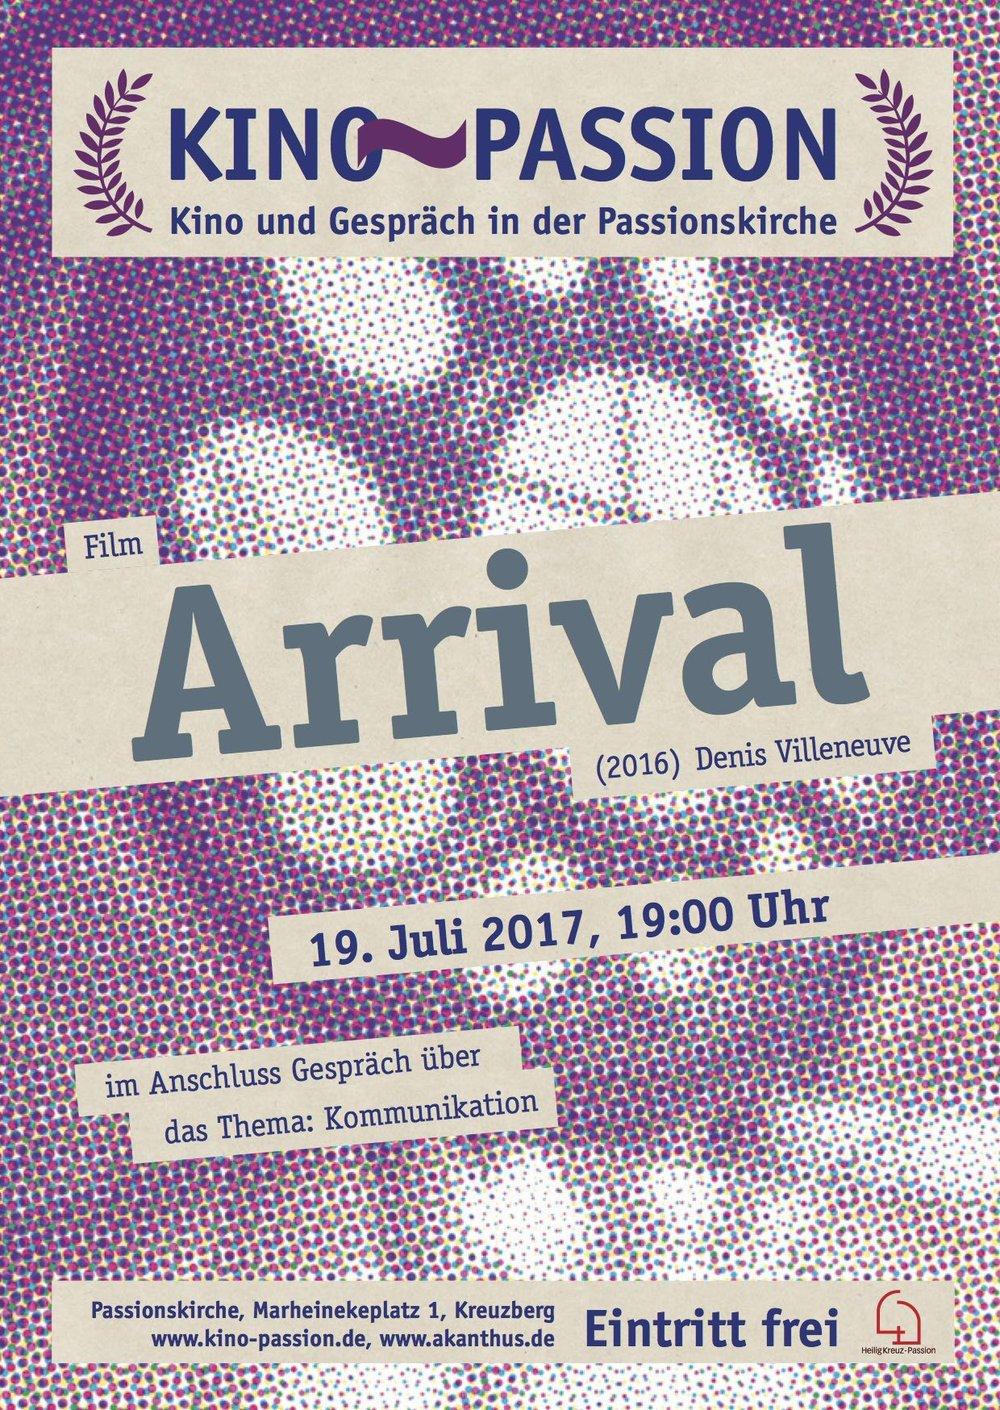 72_Kino_Passion_Arrival.jpg